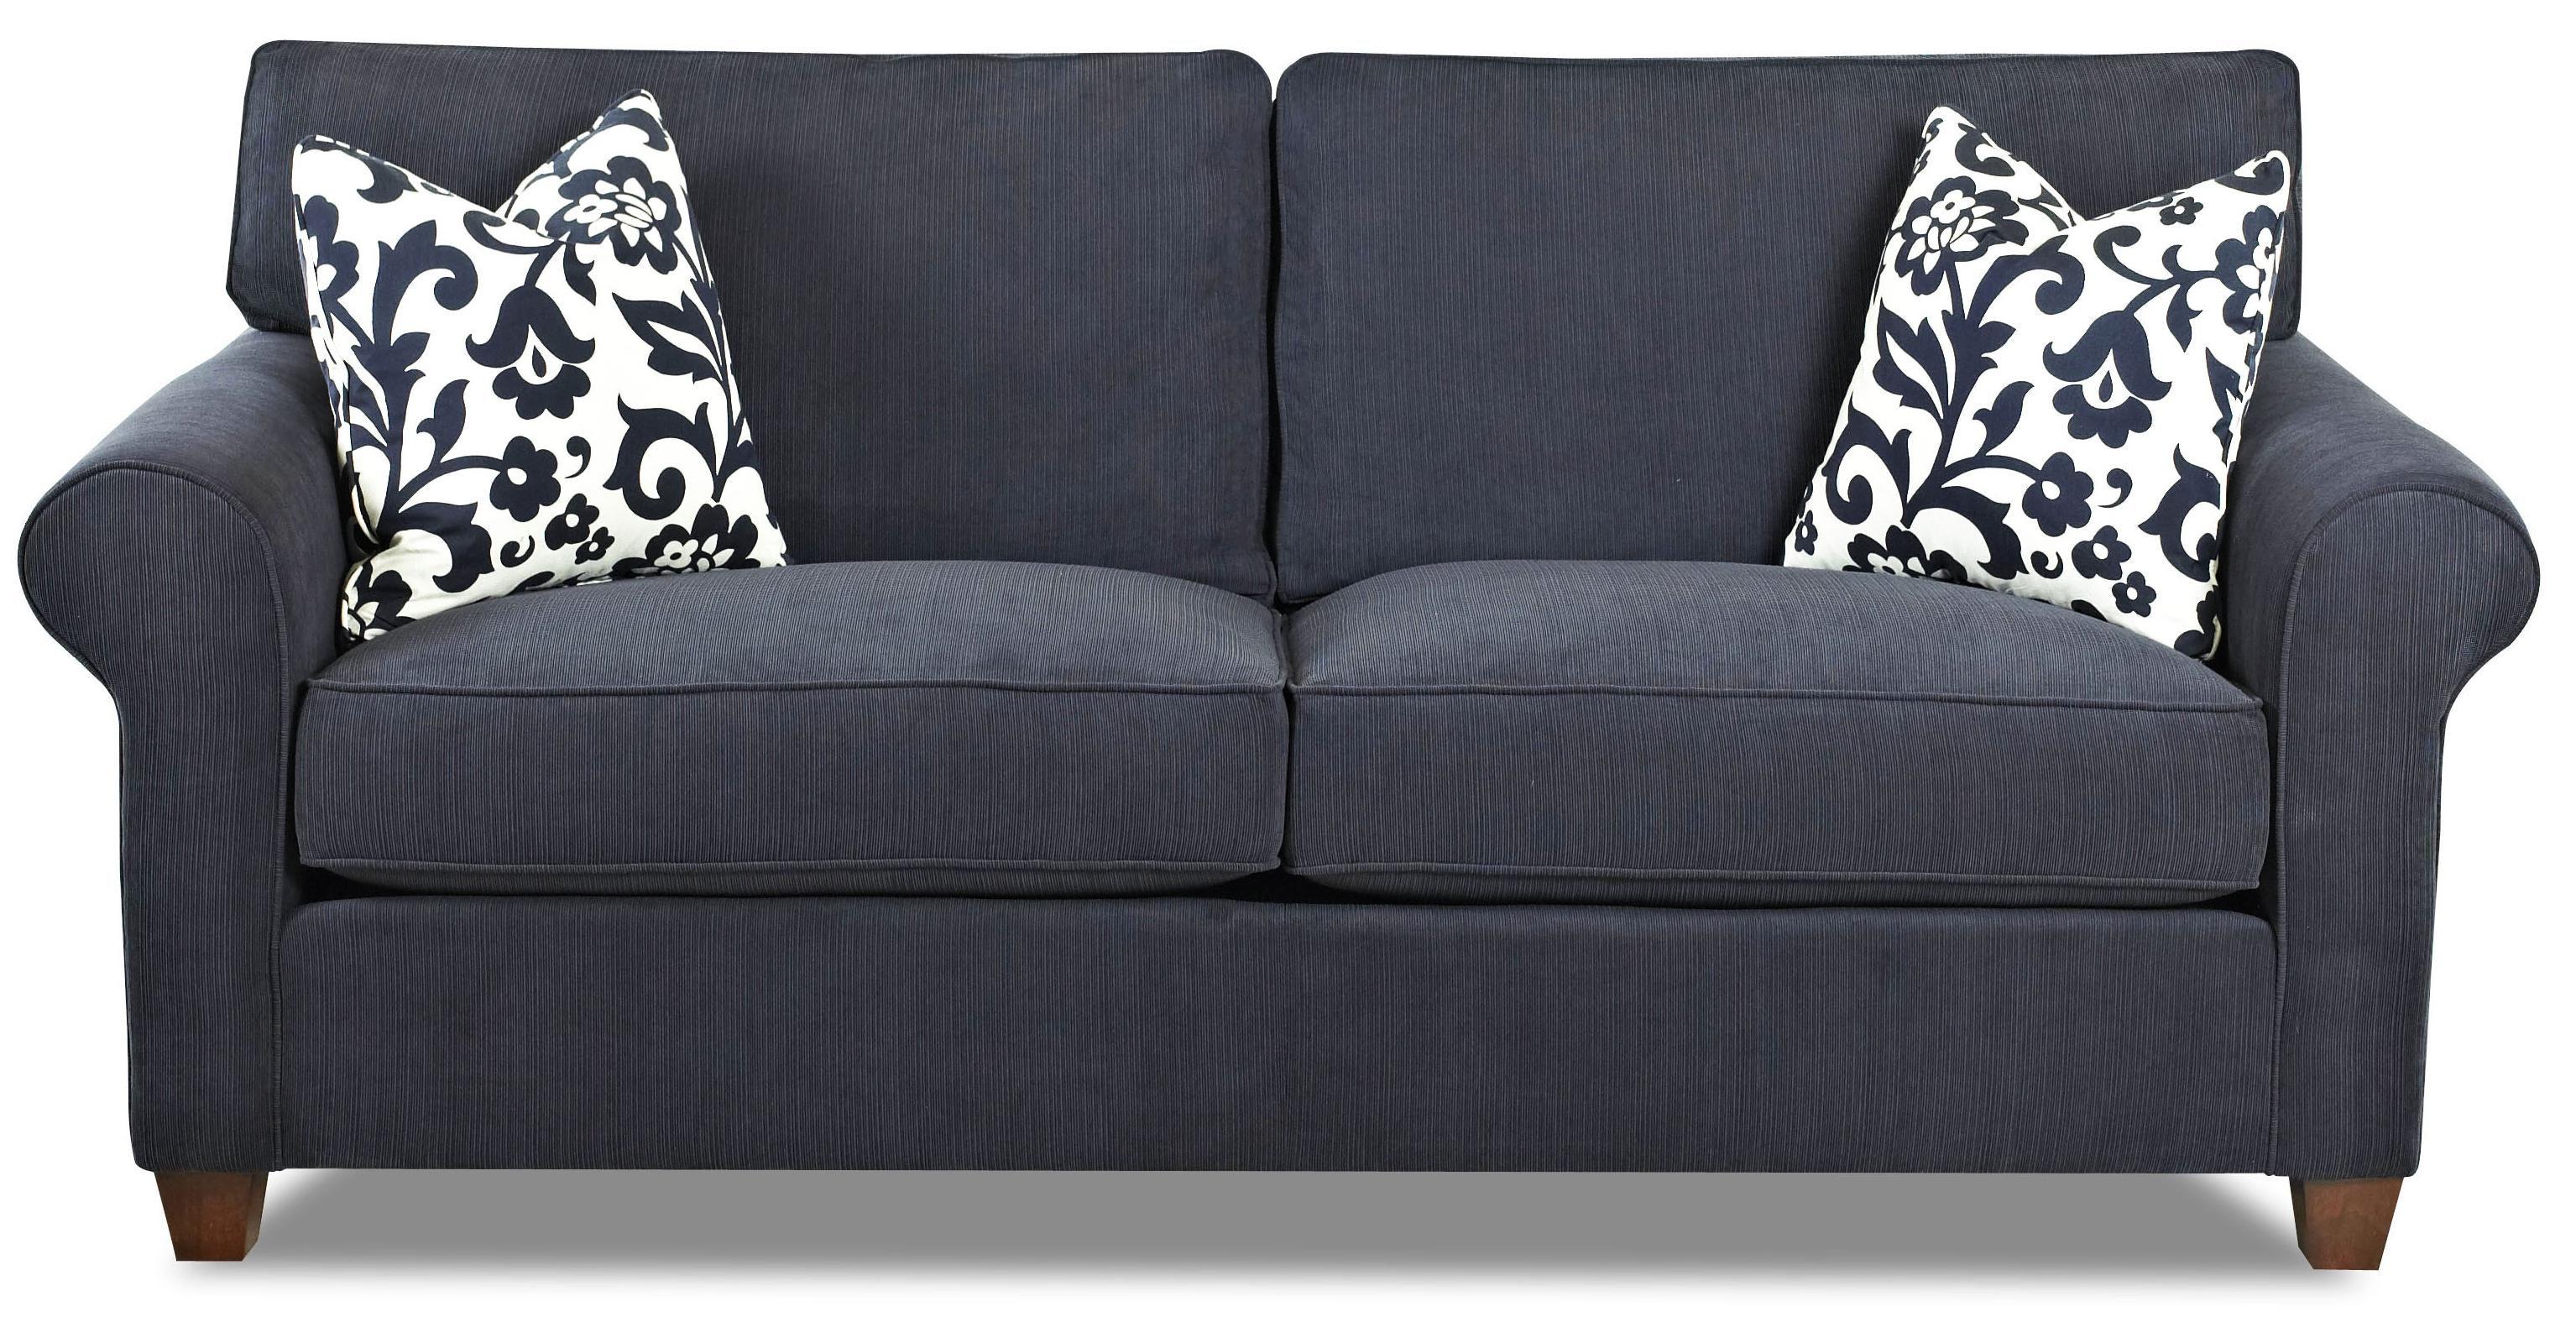 Lillington Distinctions Queen Sleeper By Klaussner Klaussner Furniture Sofa Furniture